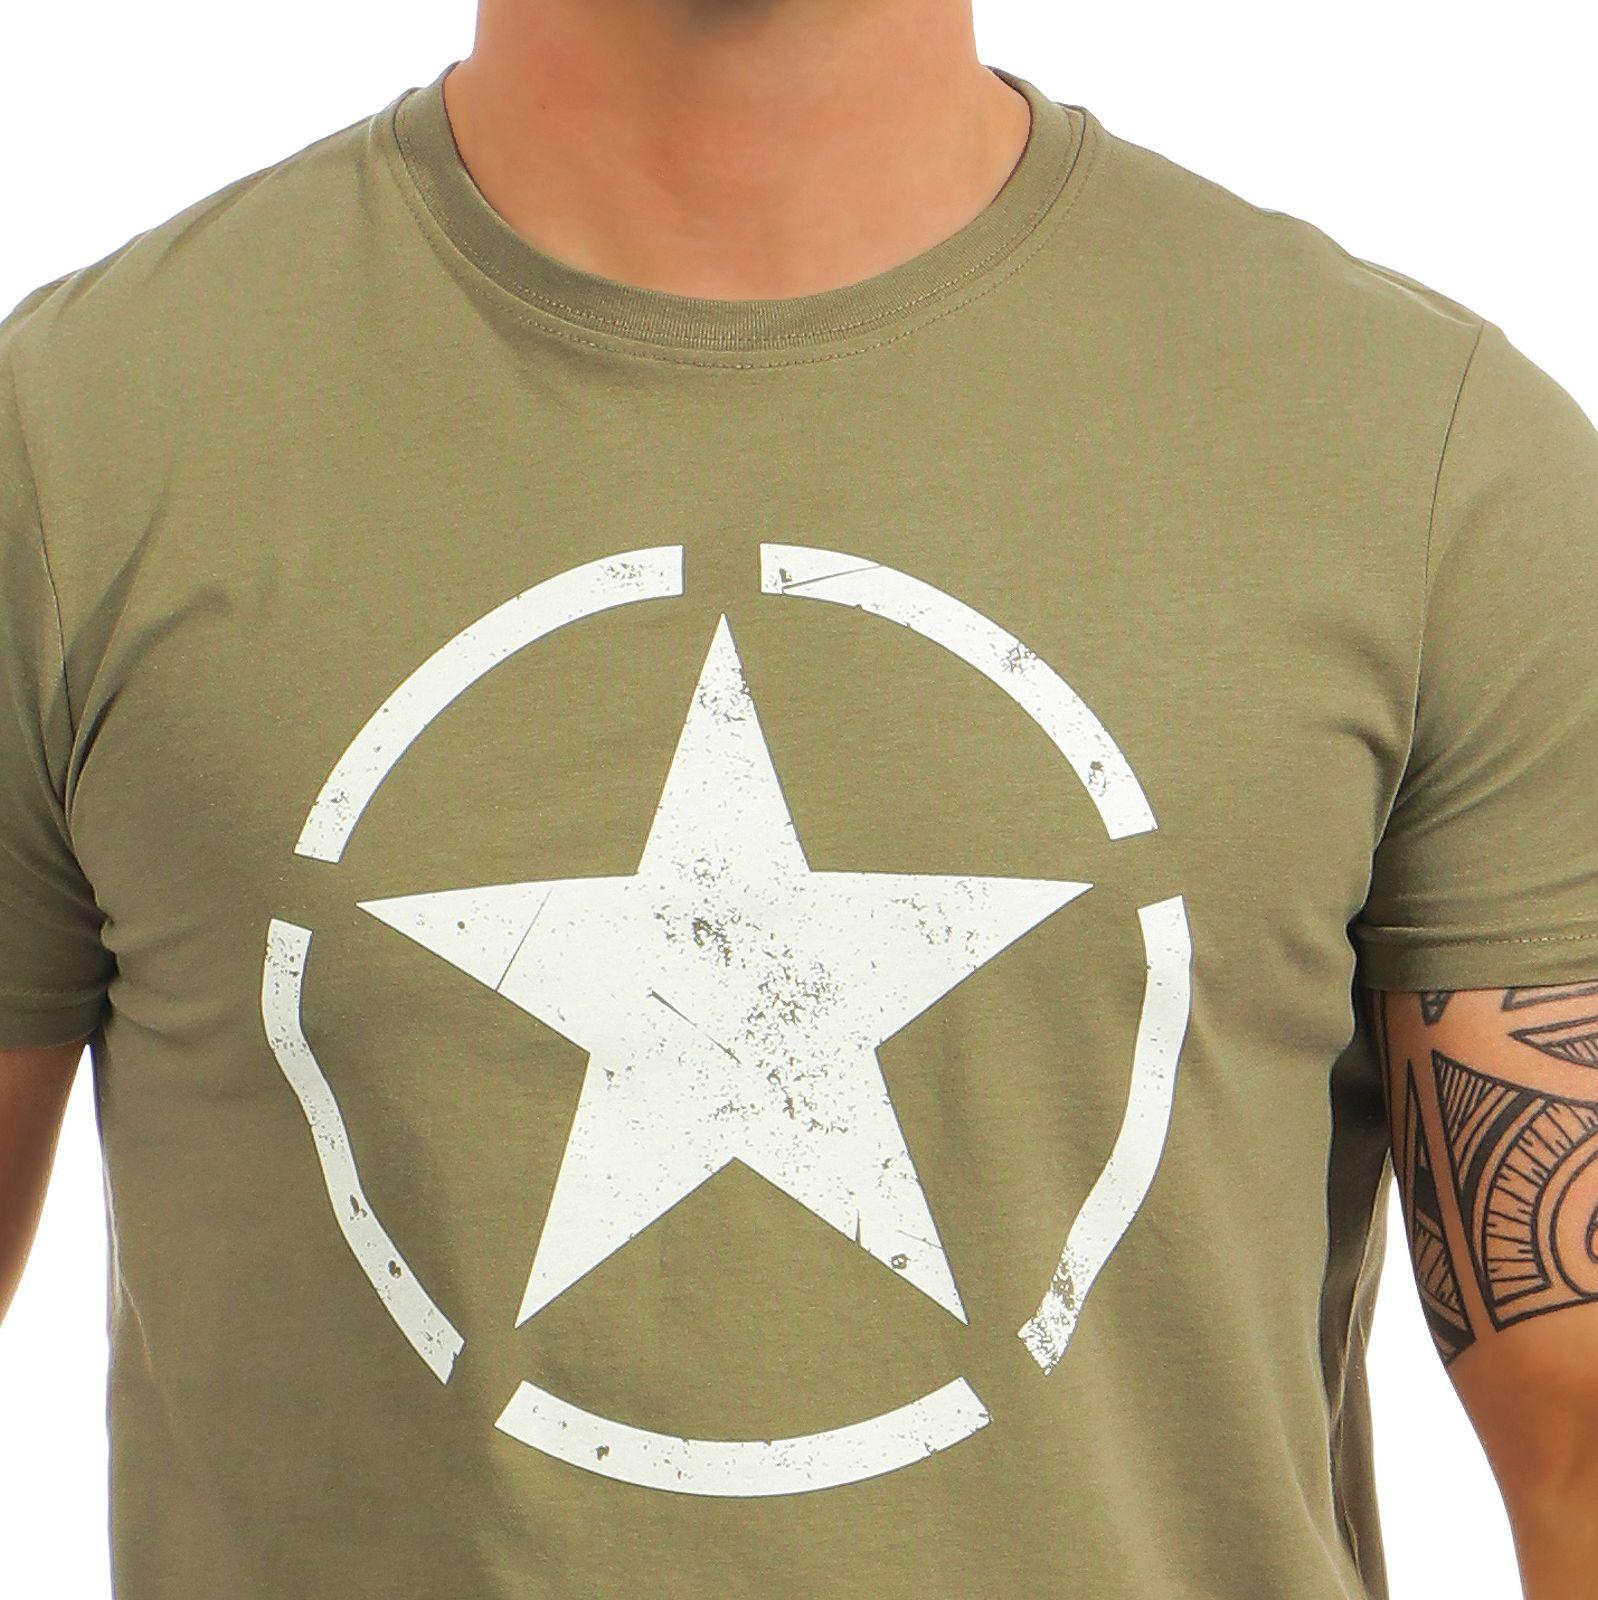 3feaad48b661 Alpha Industries Herren T-Shirt Star 121513 Männer kurzarm Tee Basic ...